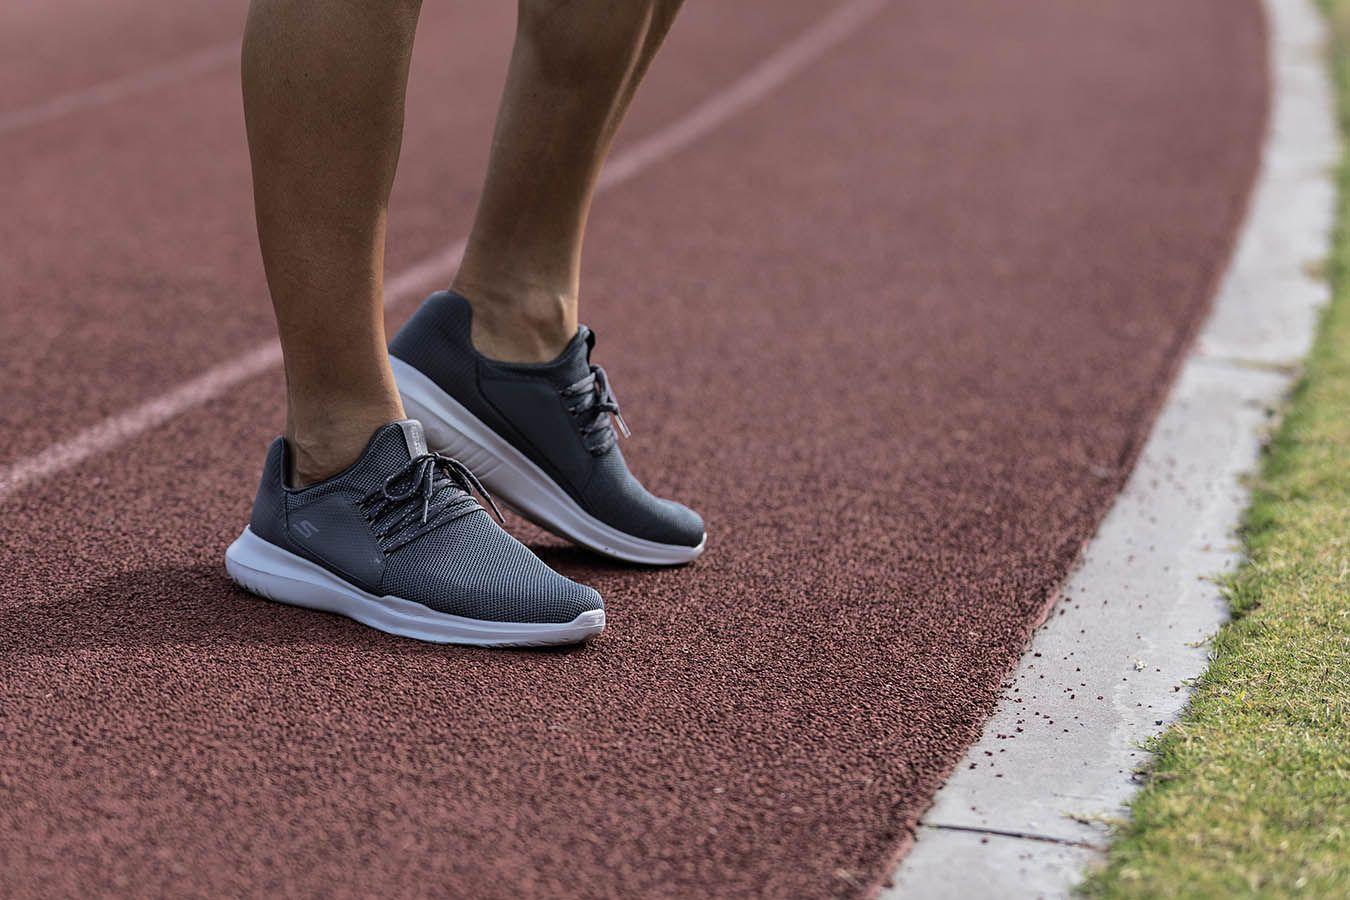 Mens Gorun Mojo The New Running Shoe Thats Versatile For Mens